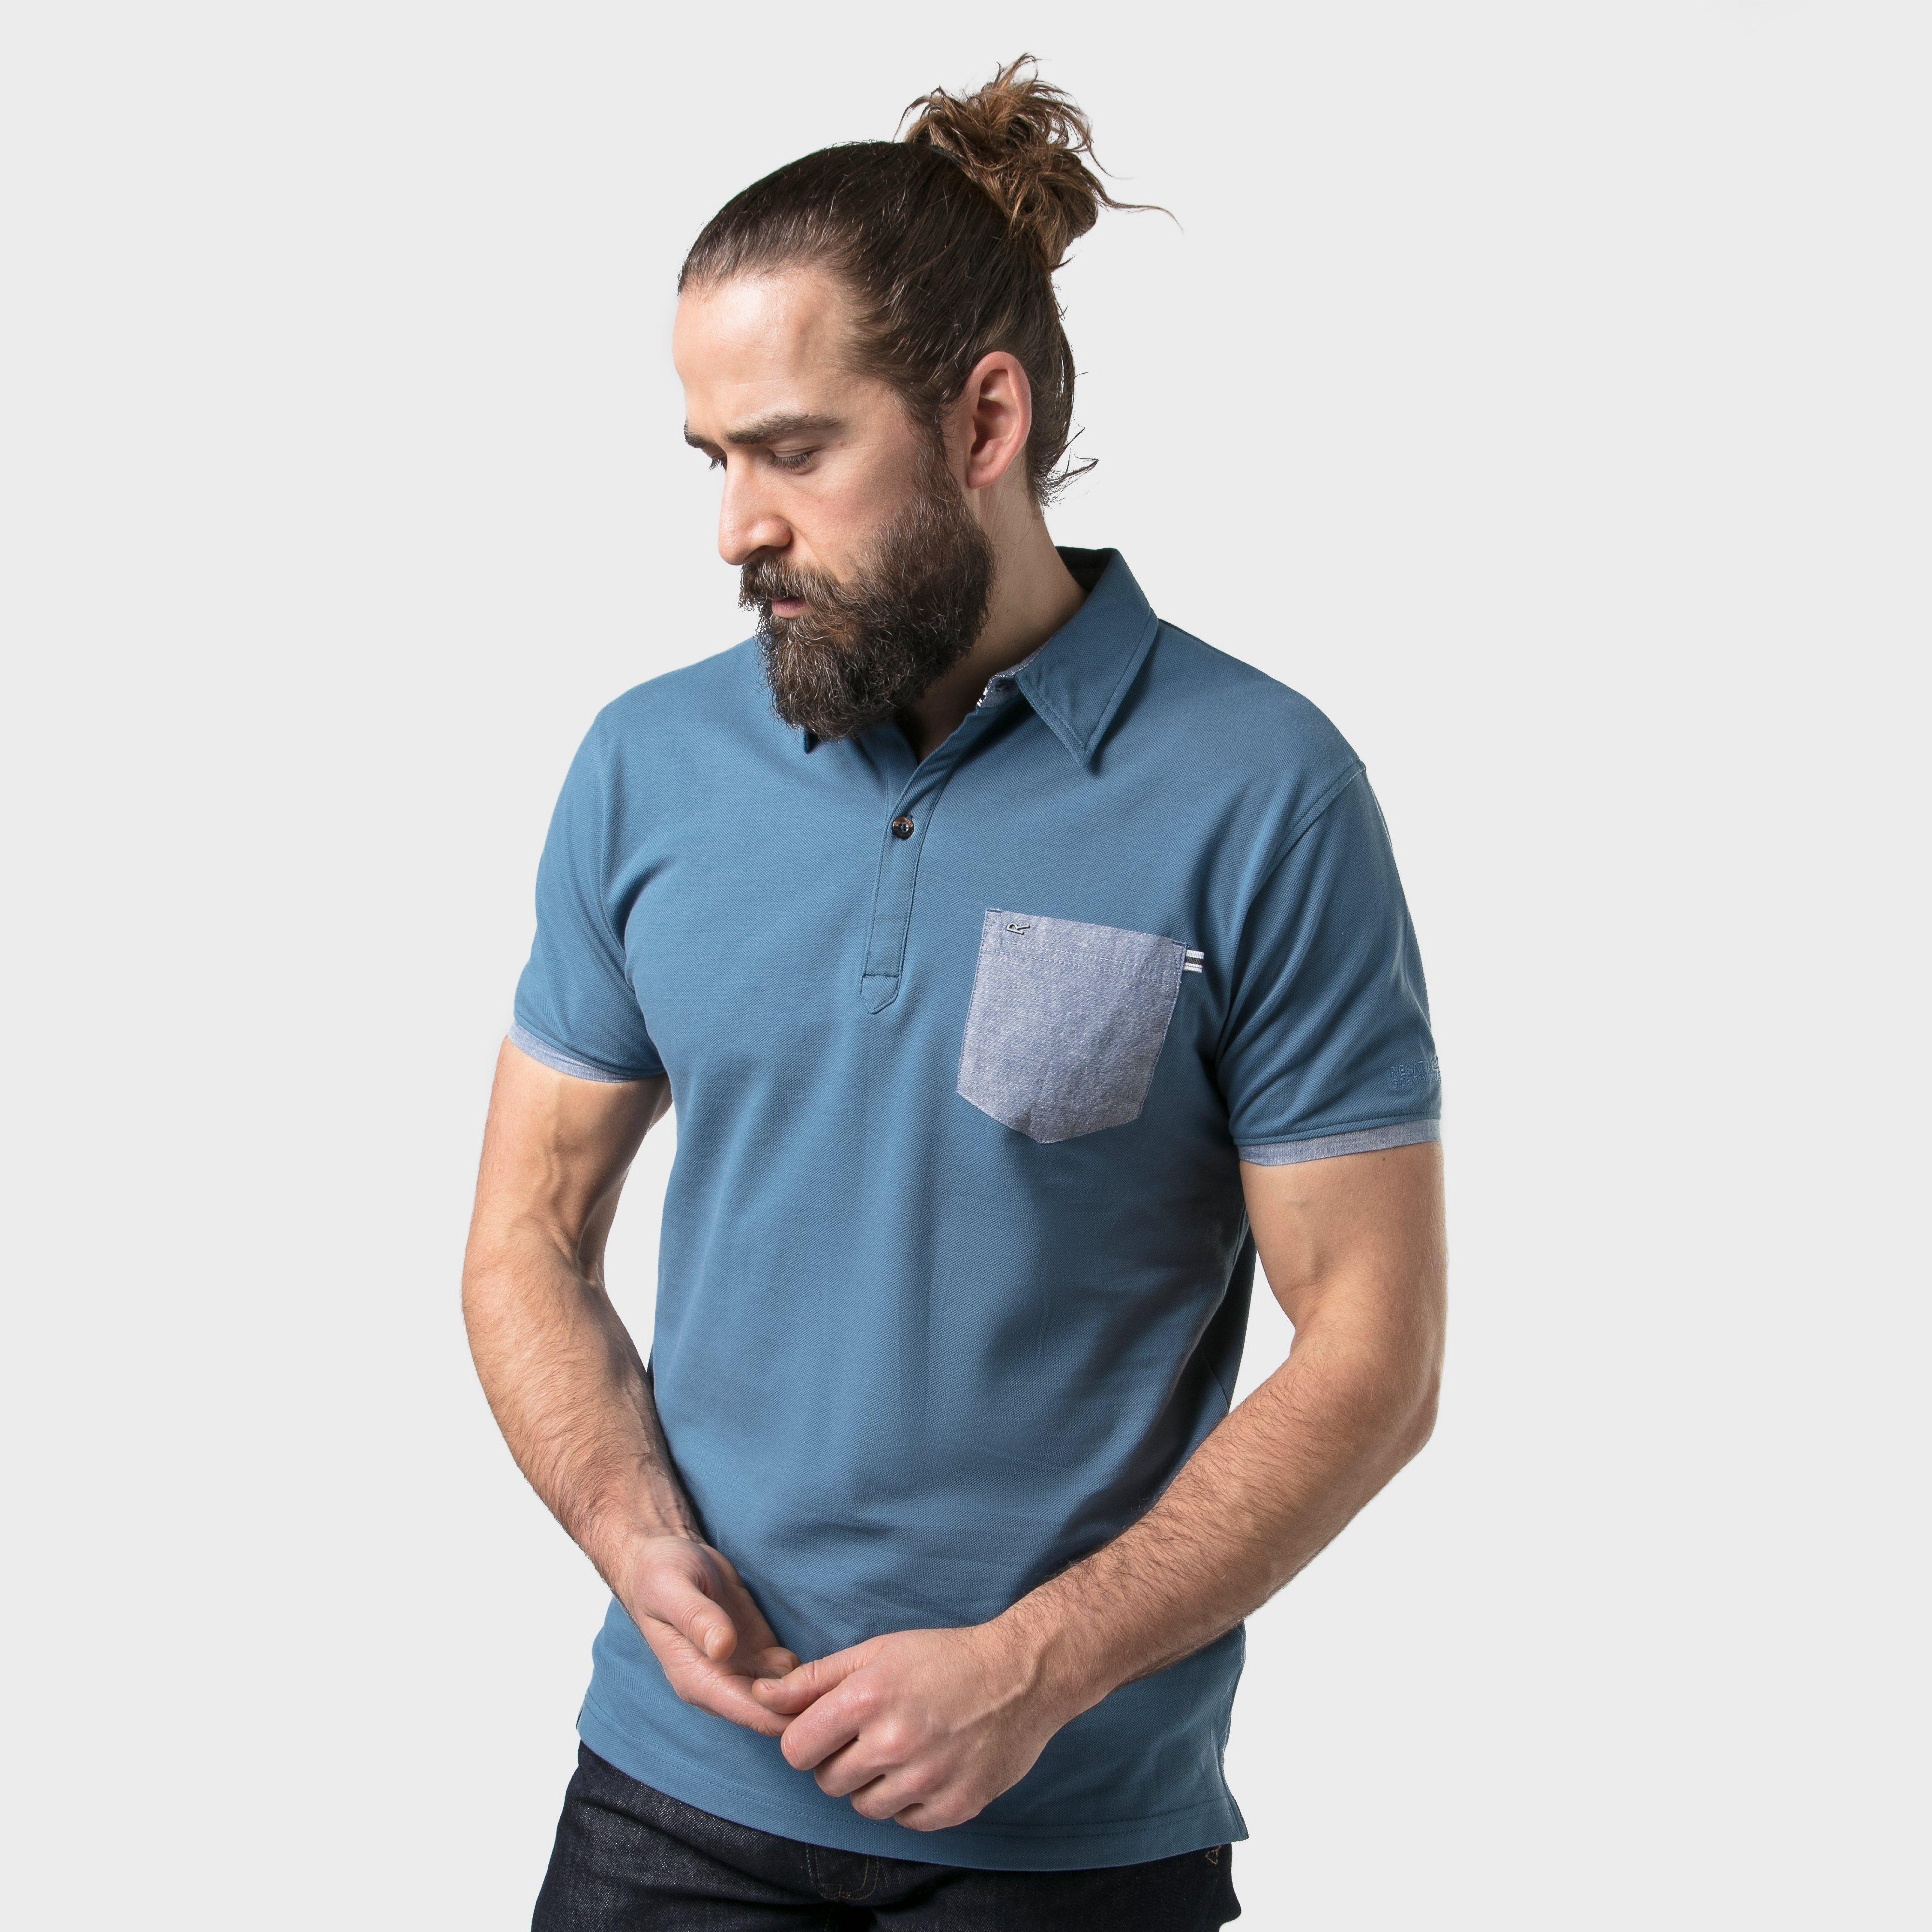 Regatta Regatta Mens Barley Polo Shirt - Blue, Blue